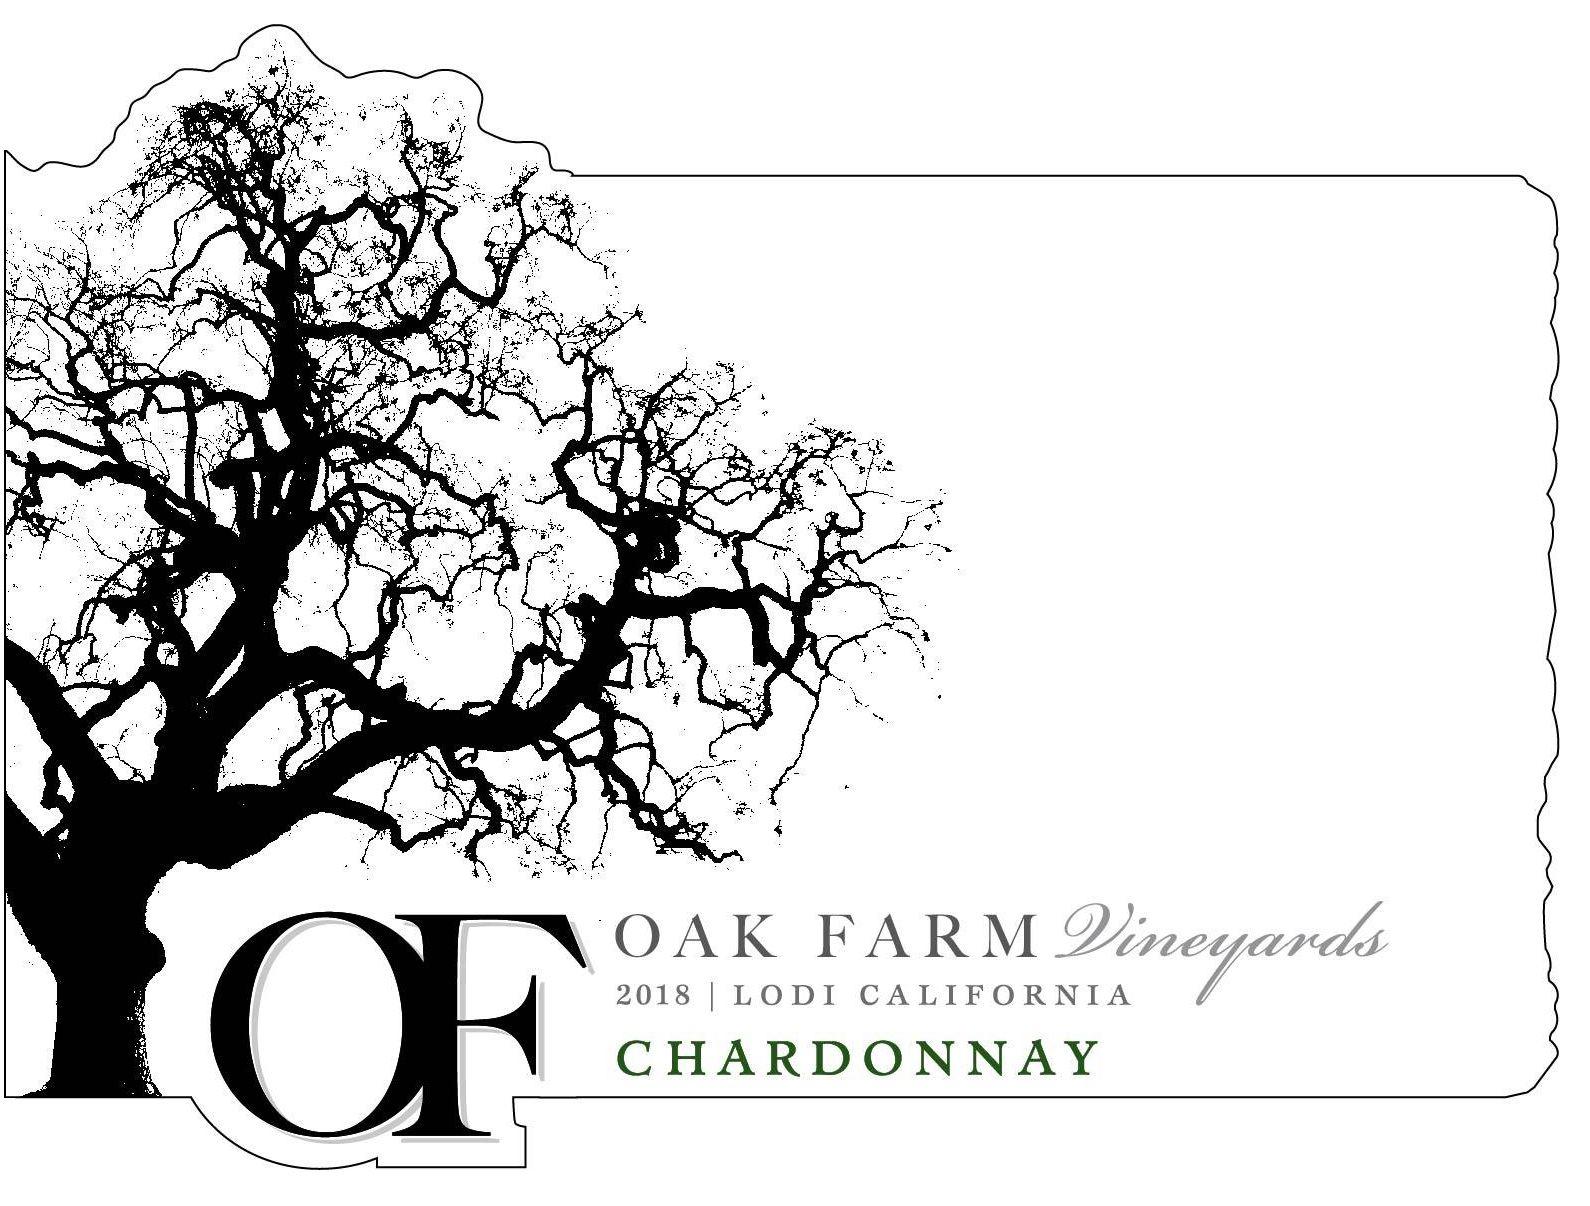 Oak Farm Chardonnay 2018